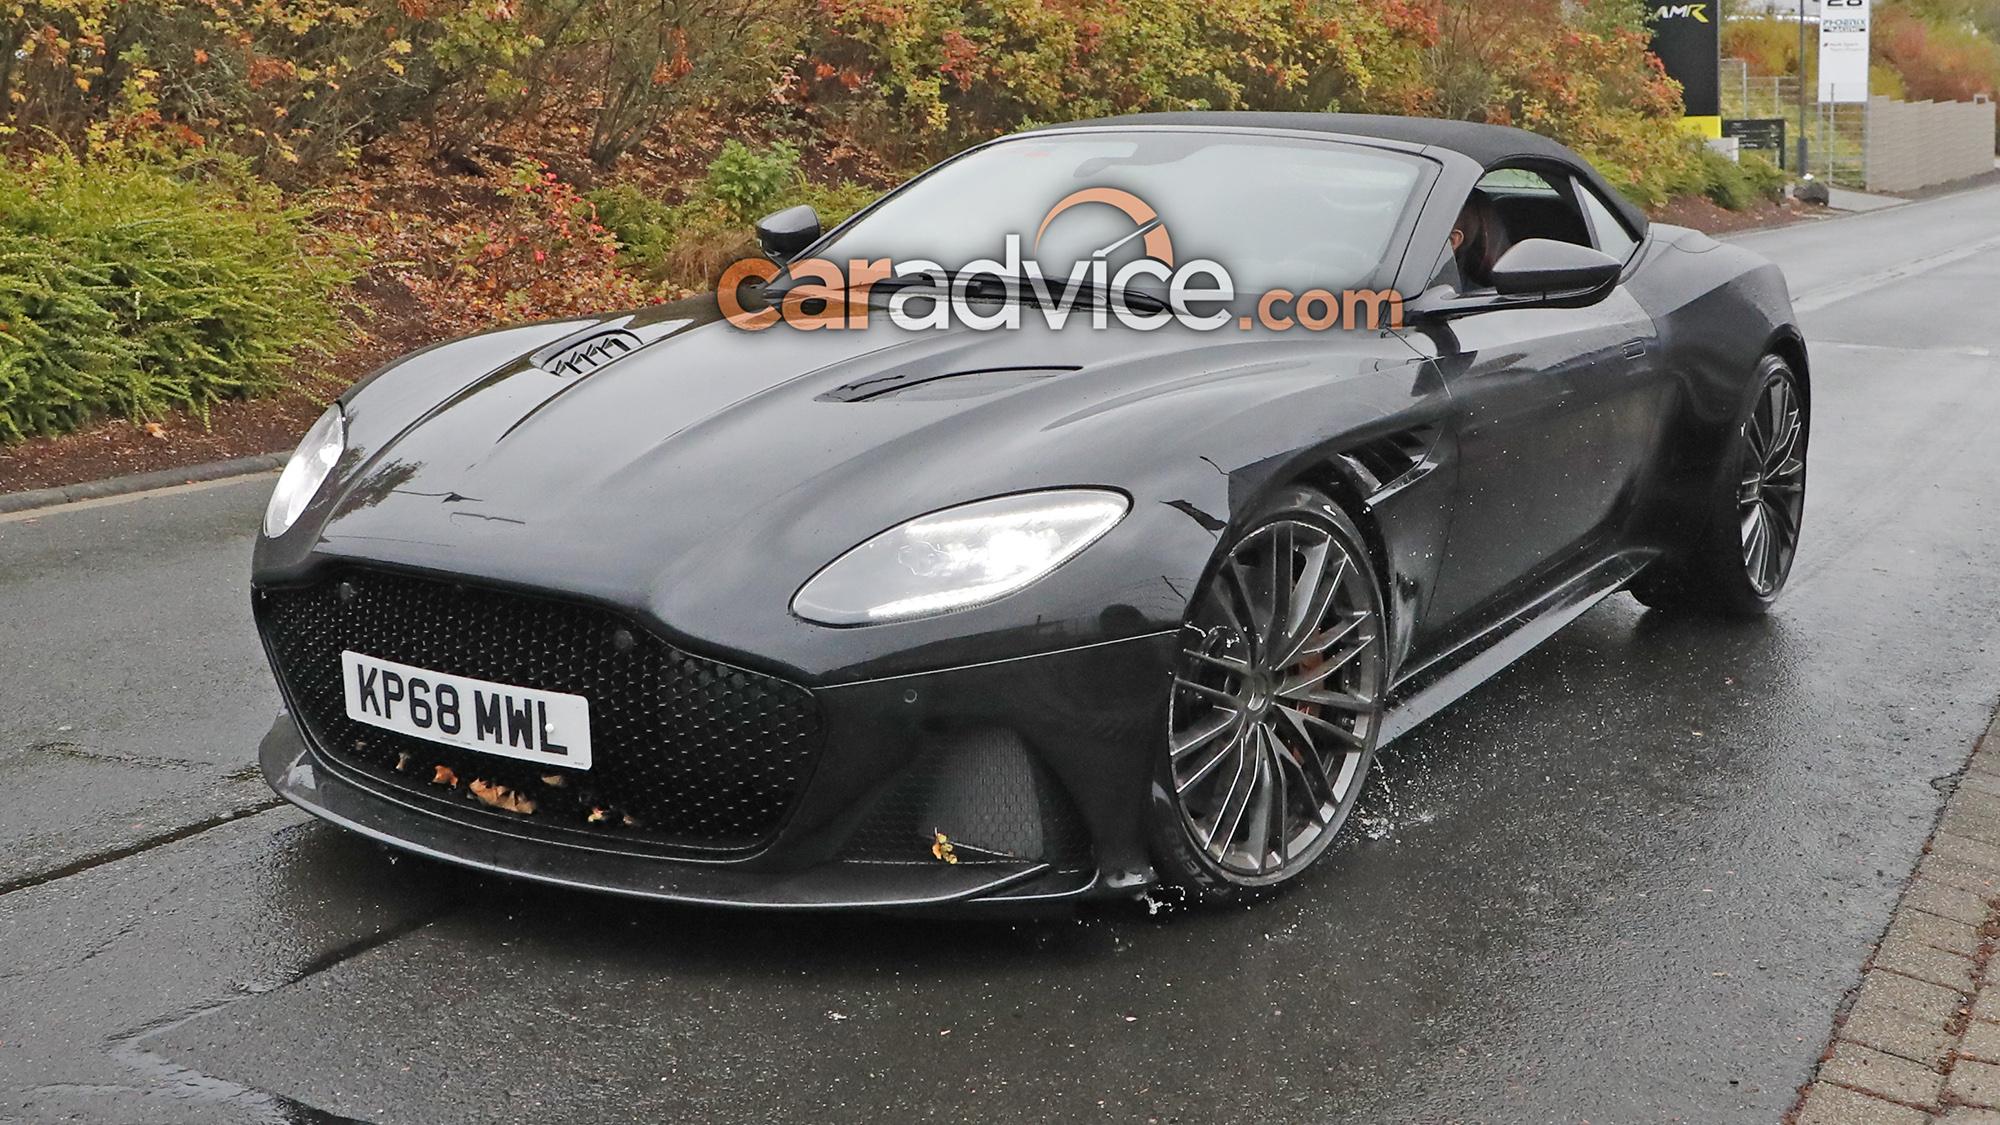 Aston Martin Dbs Superleggera Volante Spied Undisguised Caradvice